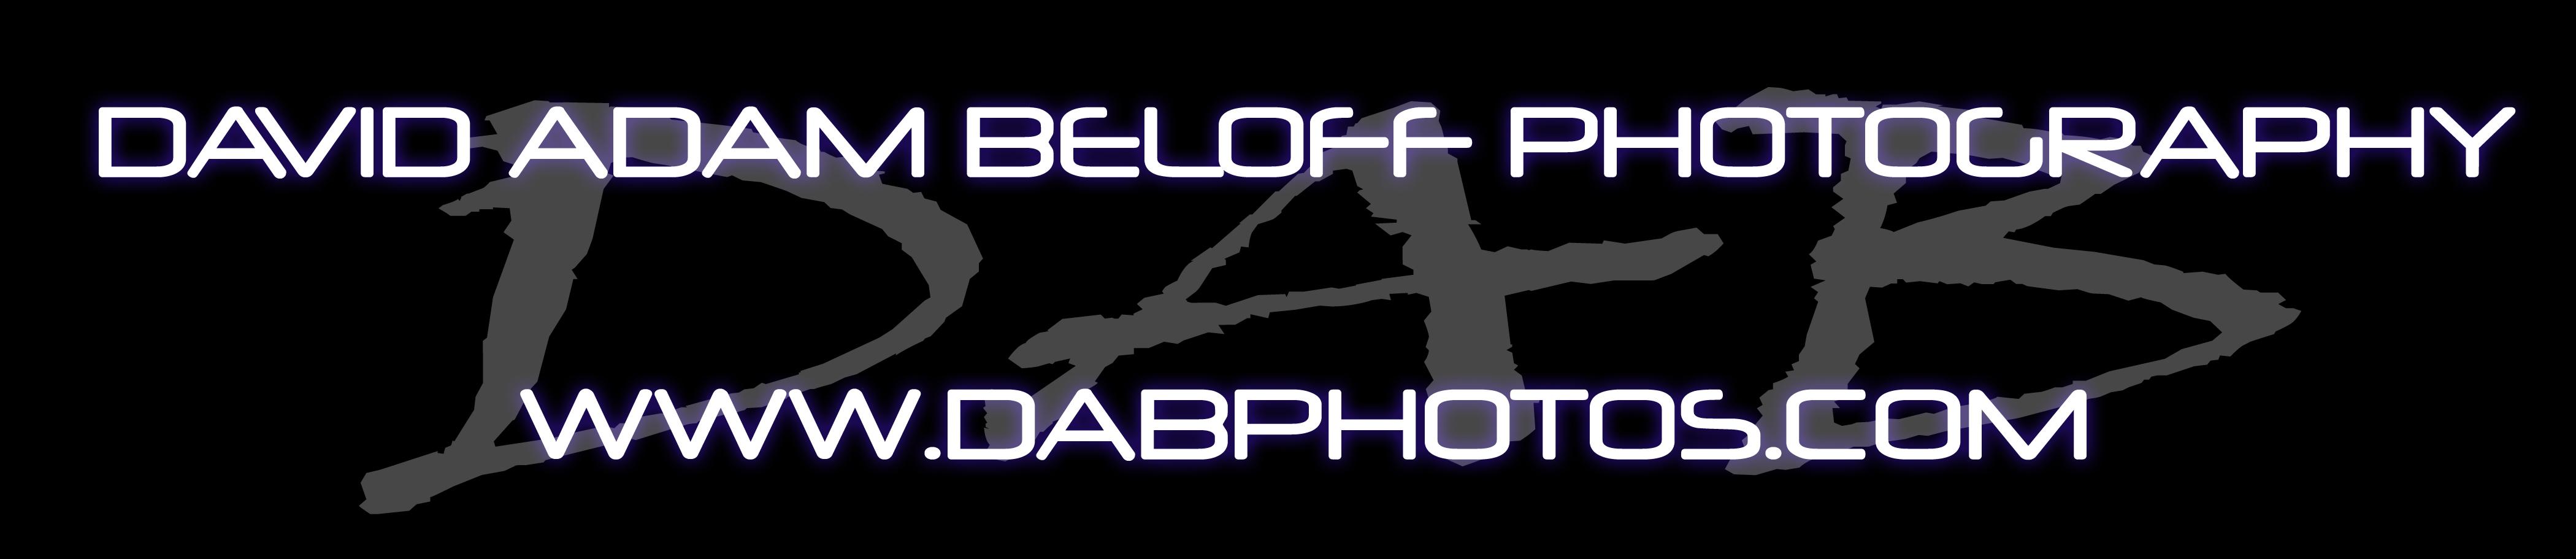 David Adam Beloff Photography